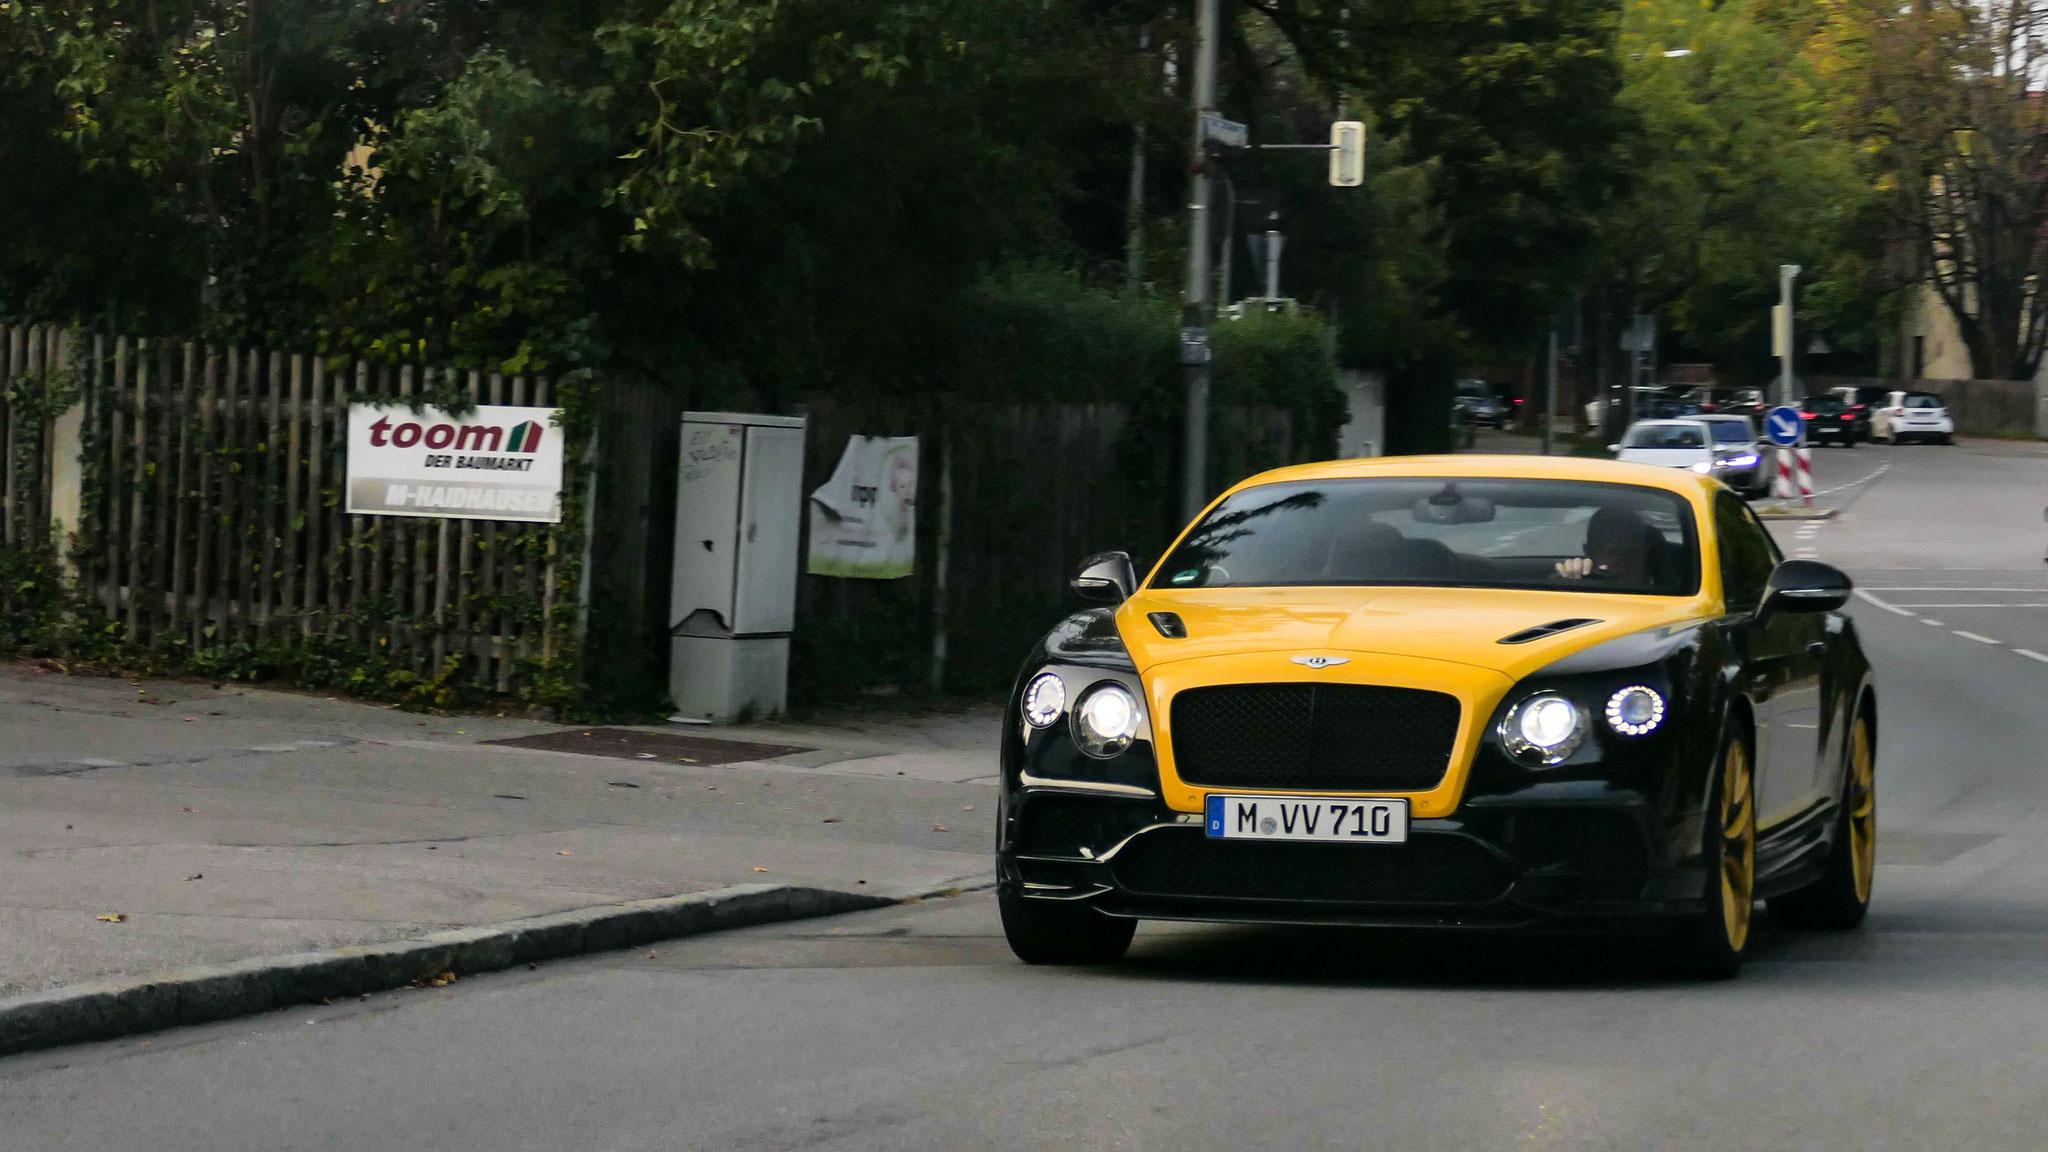 Bentley Continental 24 (1of24) - M-VV-710